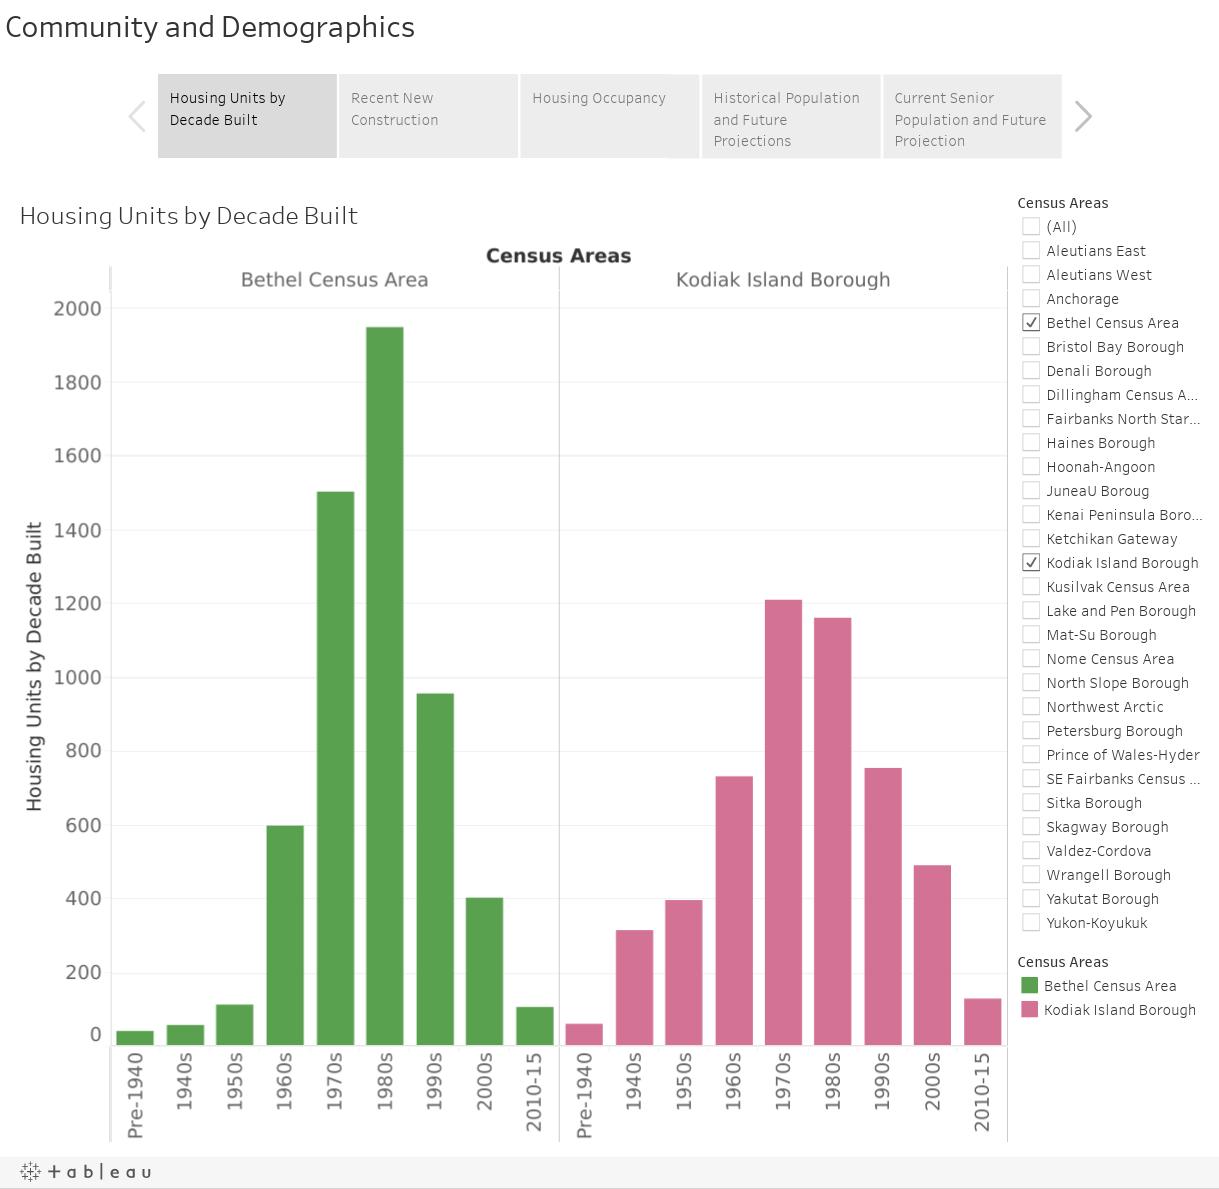 Community and Demographics